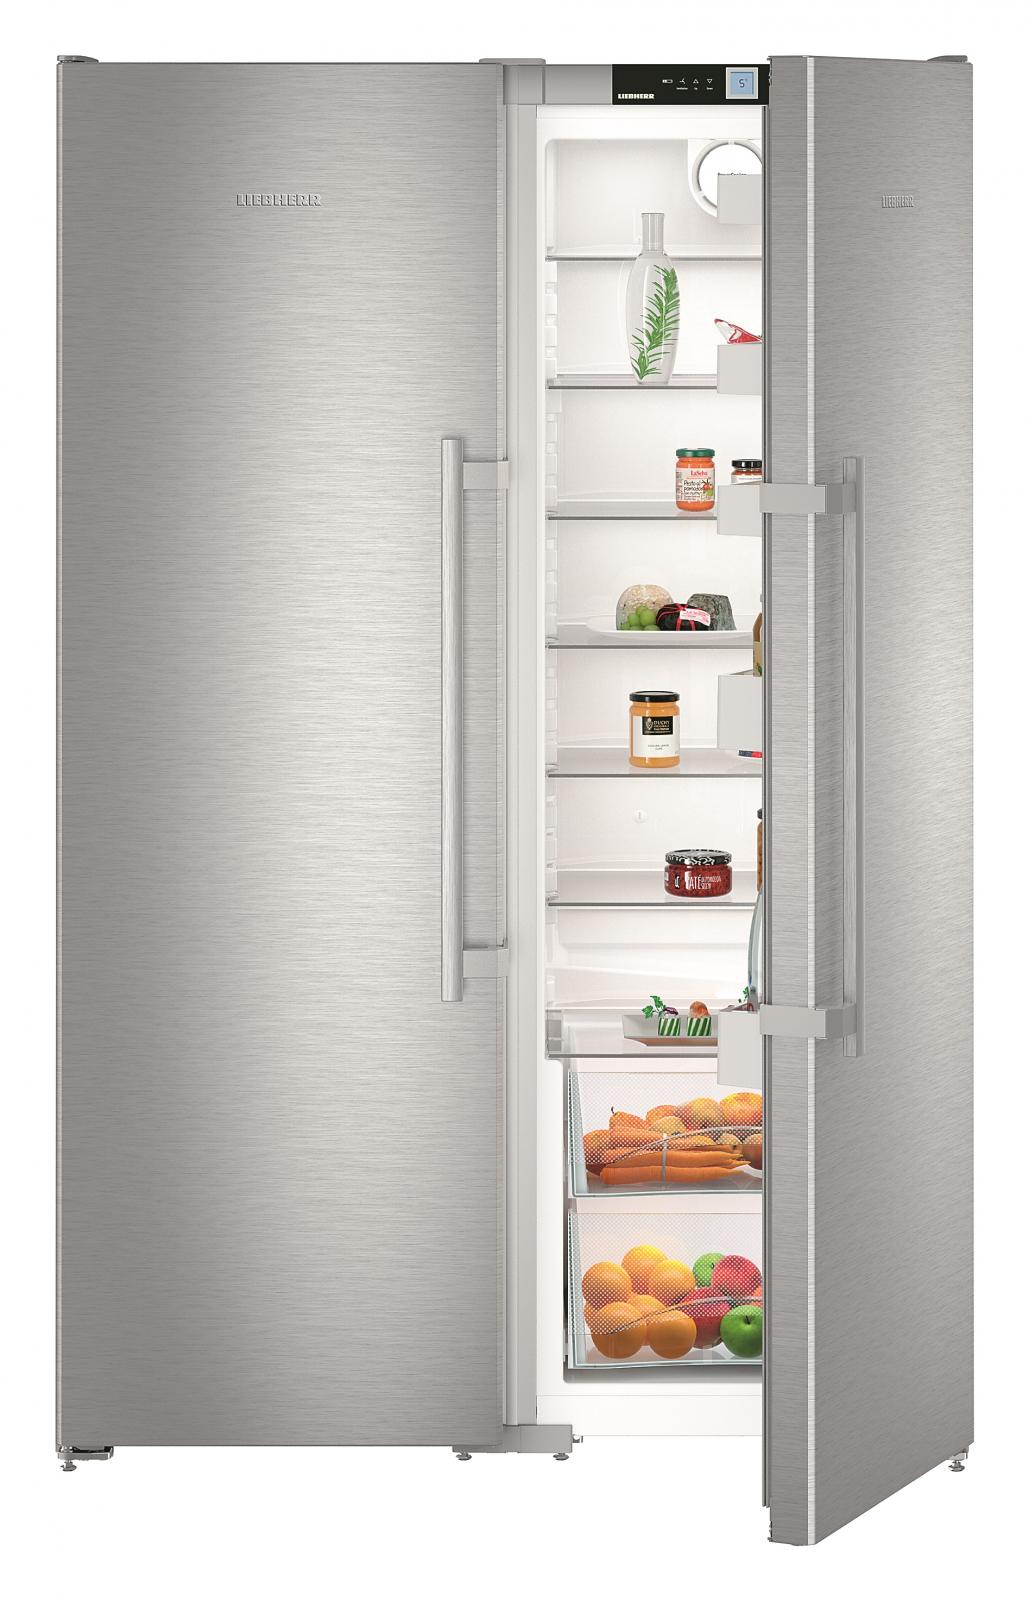 купить Side-by-side холодильник Liebherr SBSef 7242 Украина фото 3